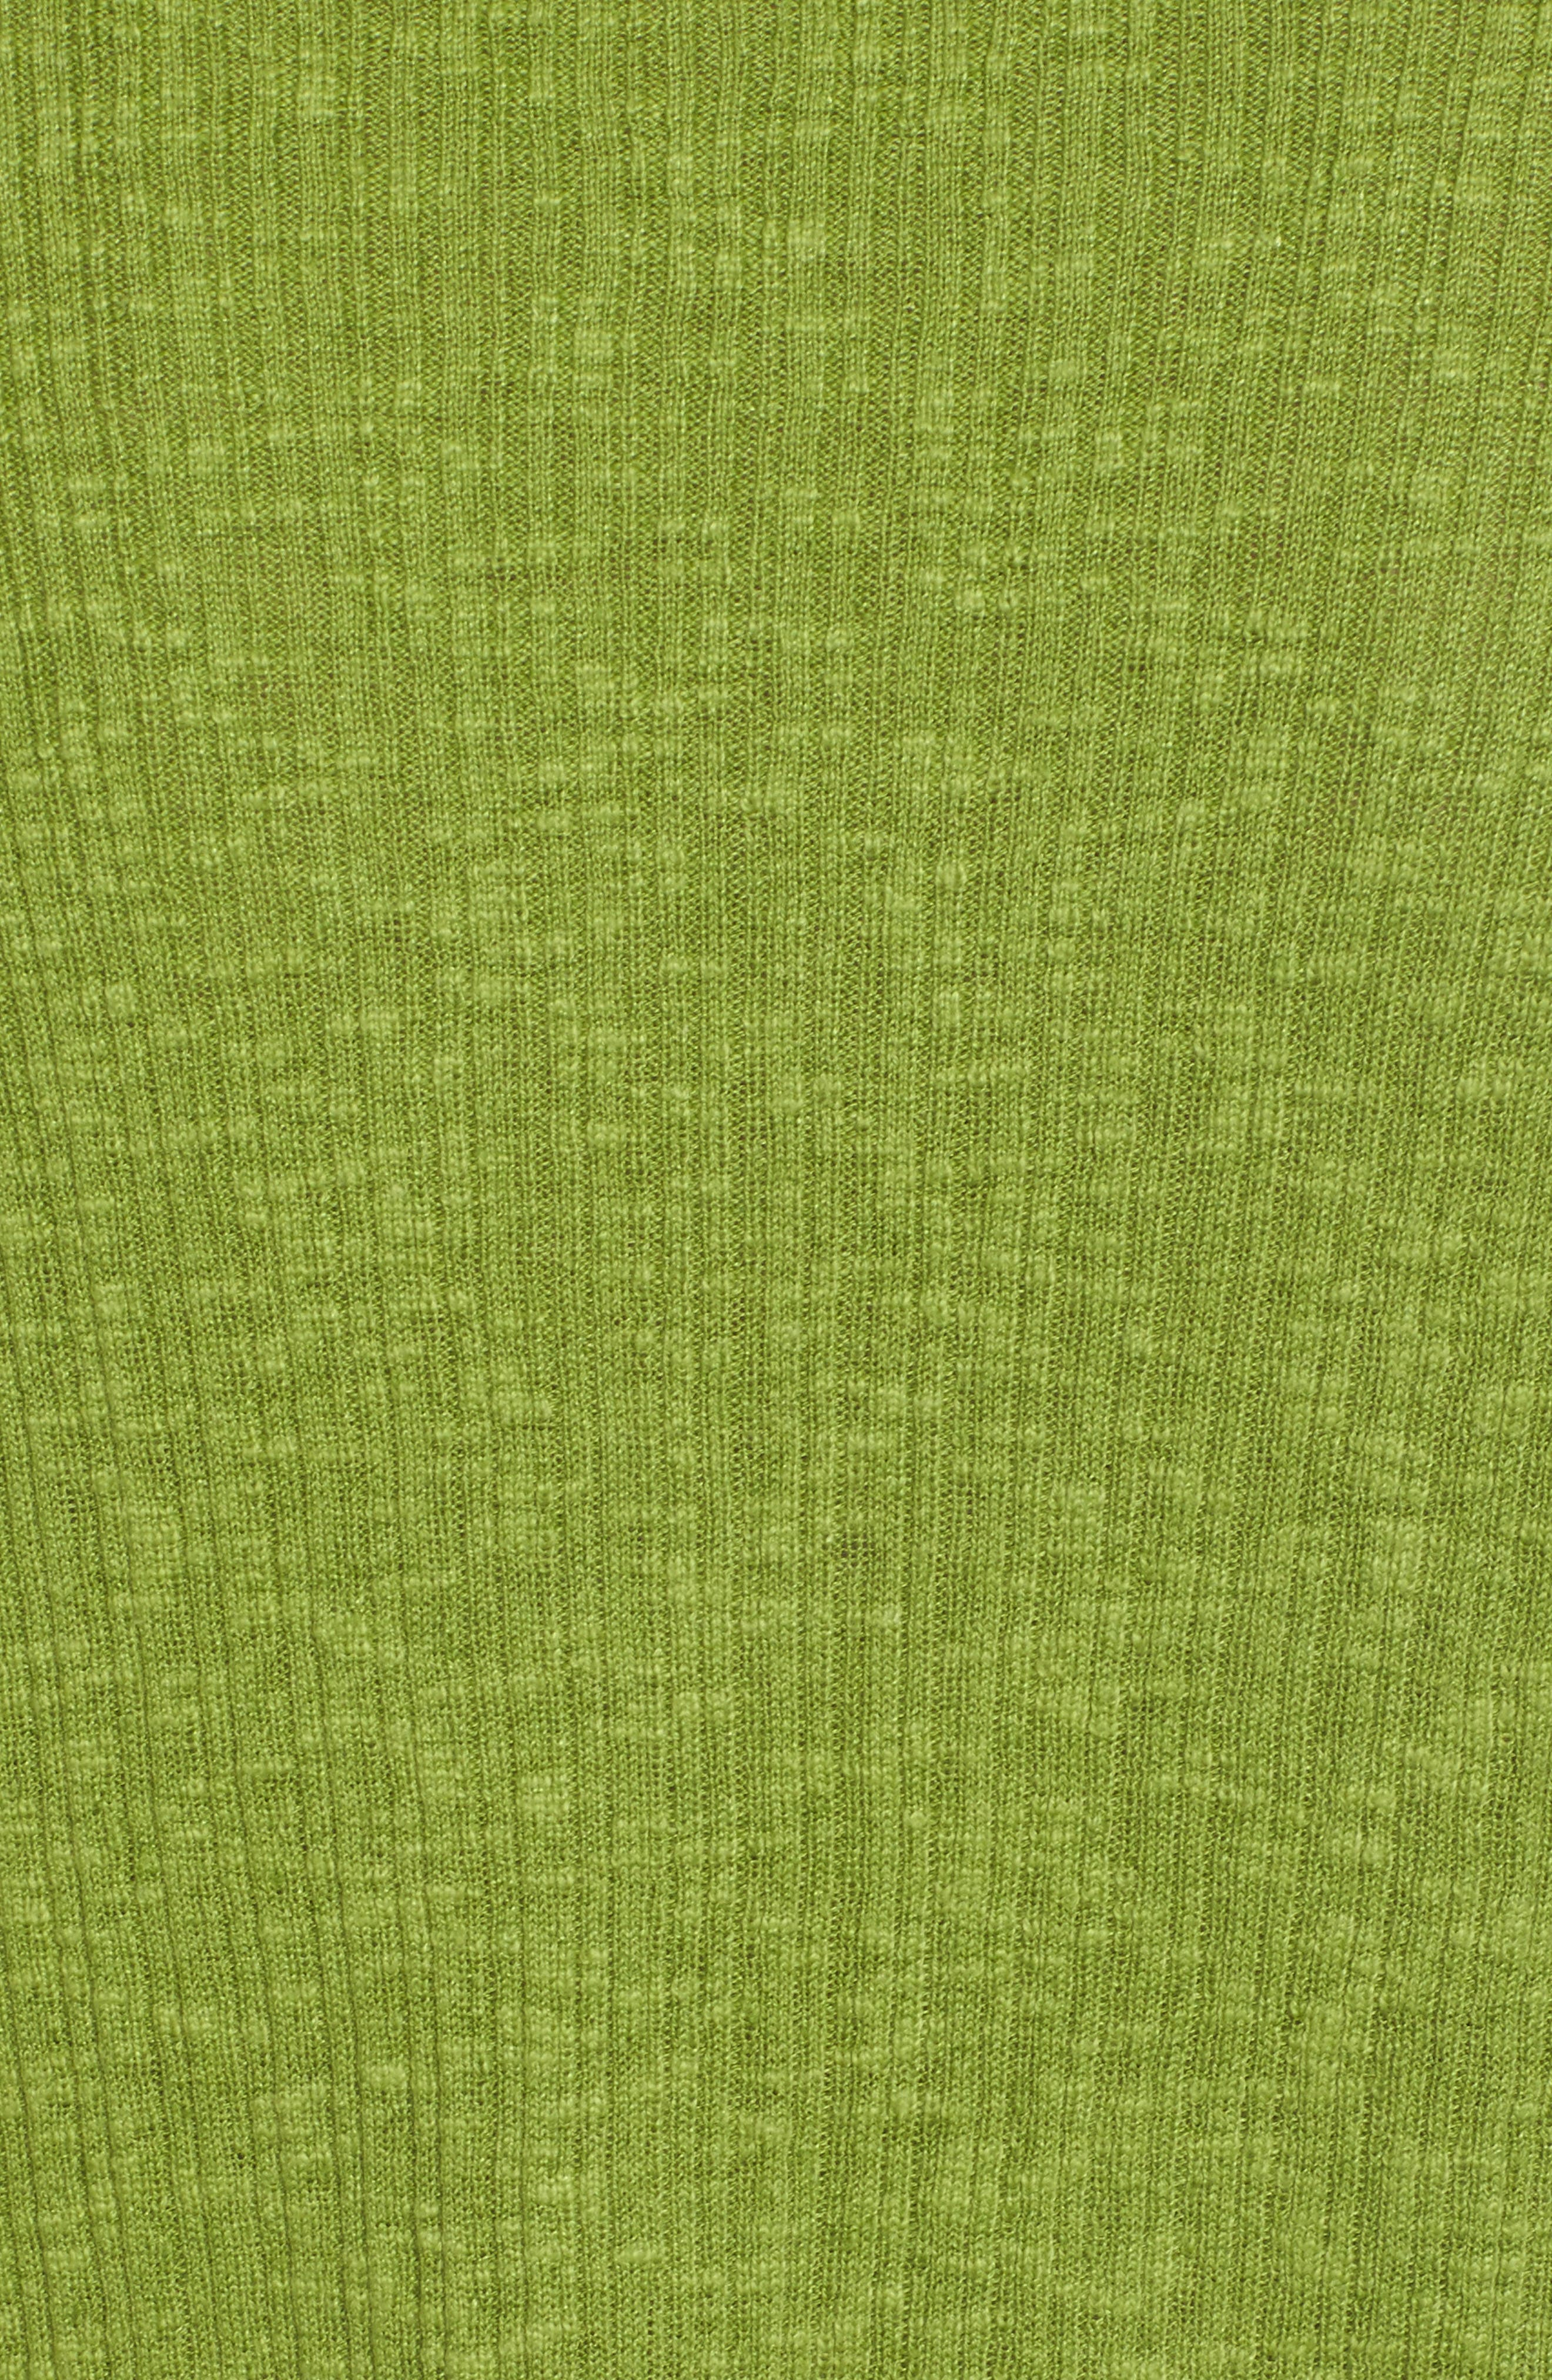 Organic Linen & Cotton Crewneck Sweater,                             Alternate thumbnail 23, color,